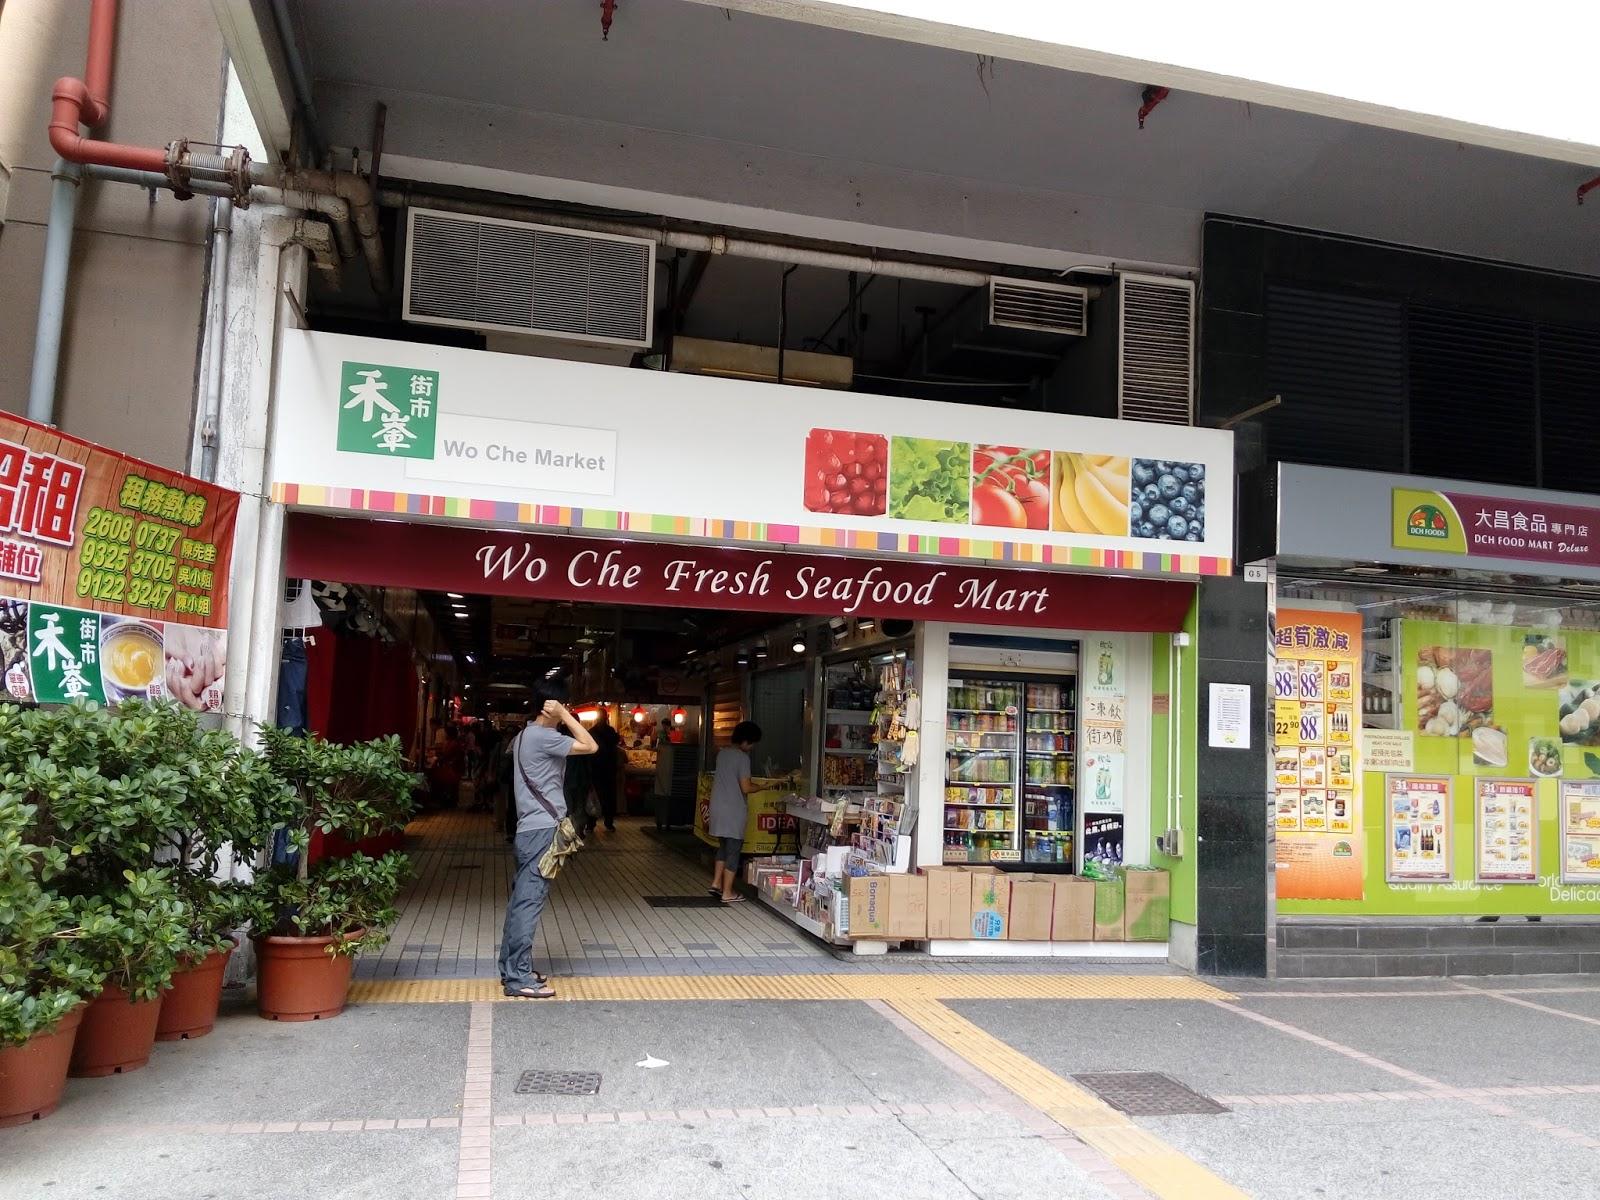 Grassroots O2: [領展商場] 禾輋廣場 @2016-10-29